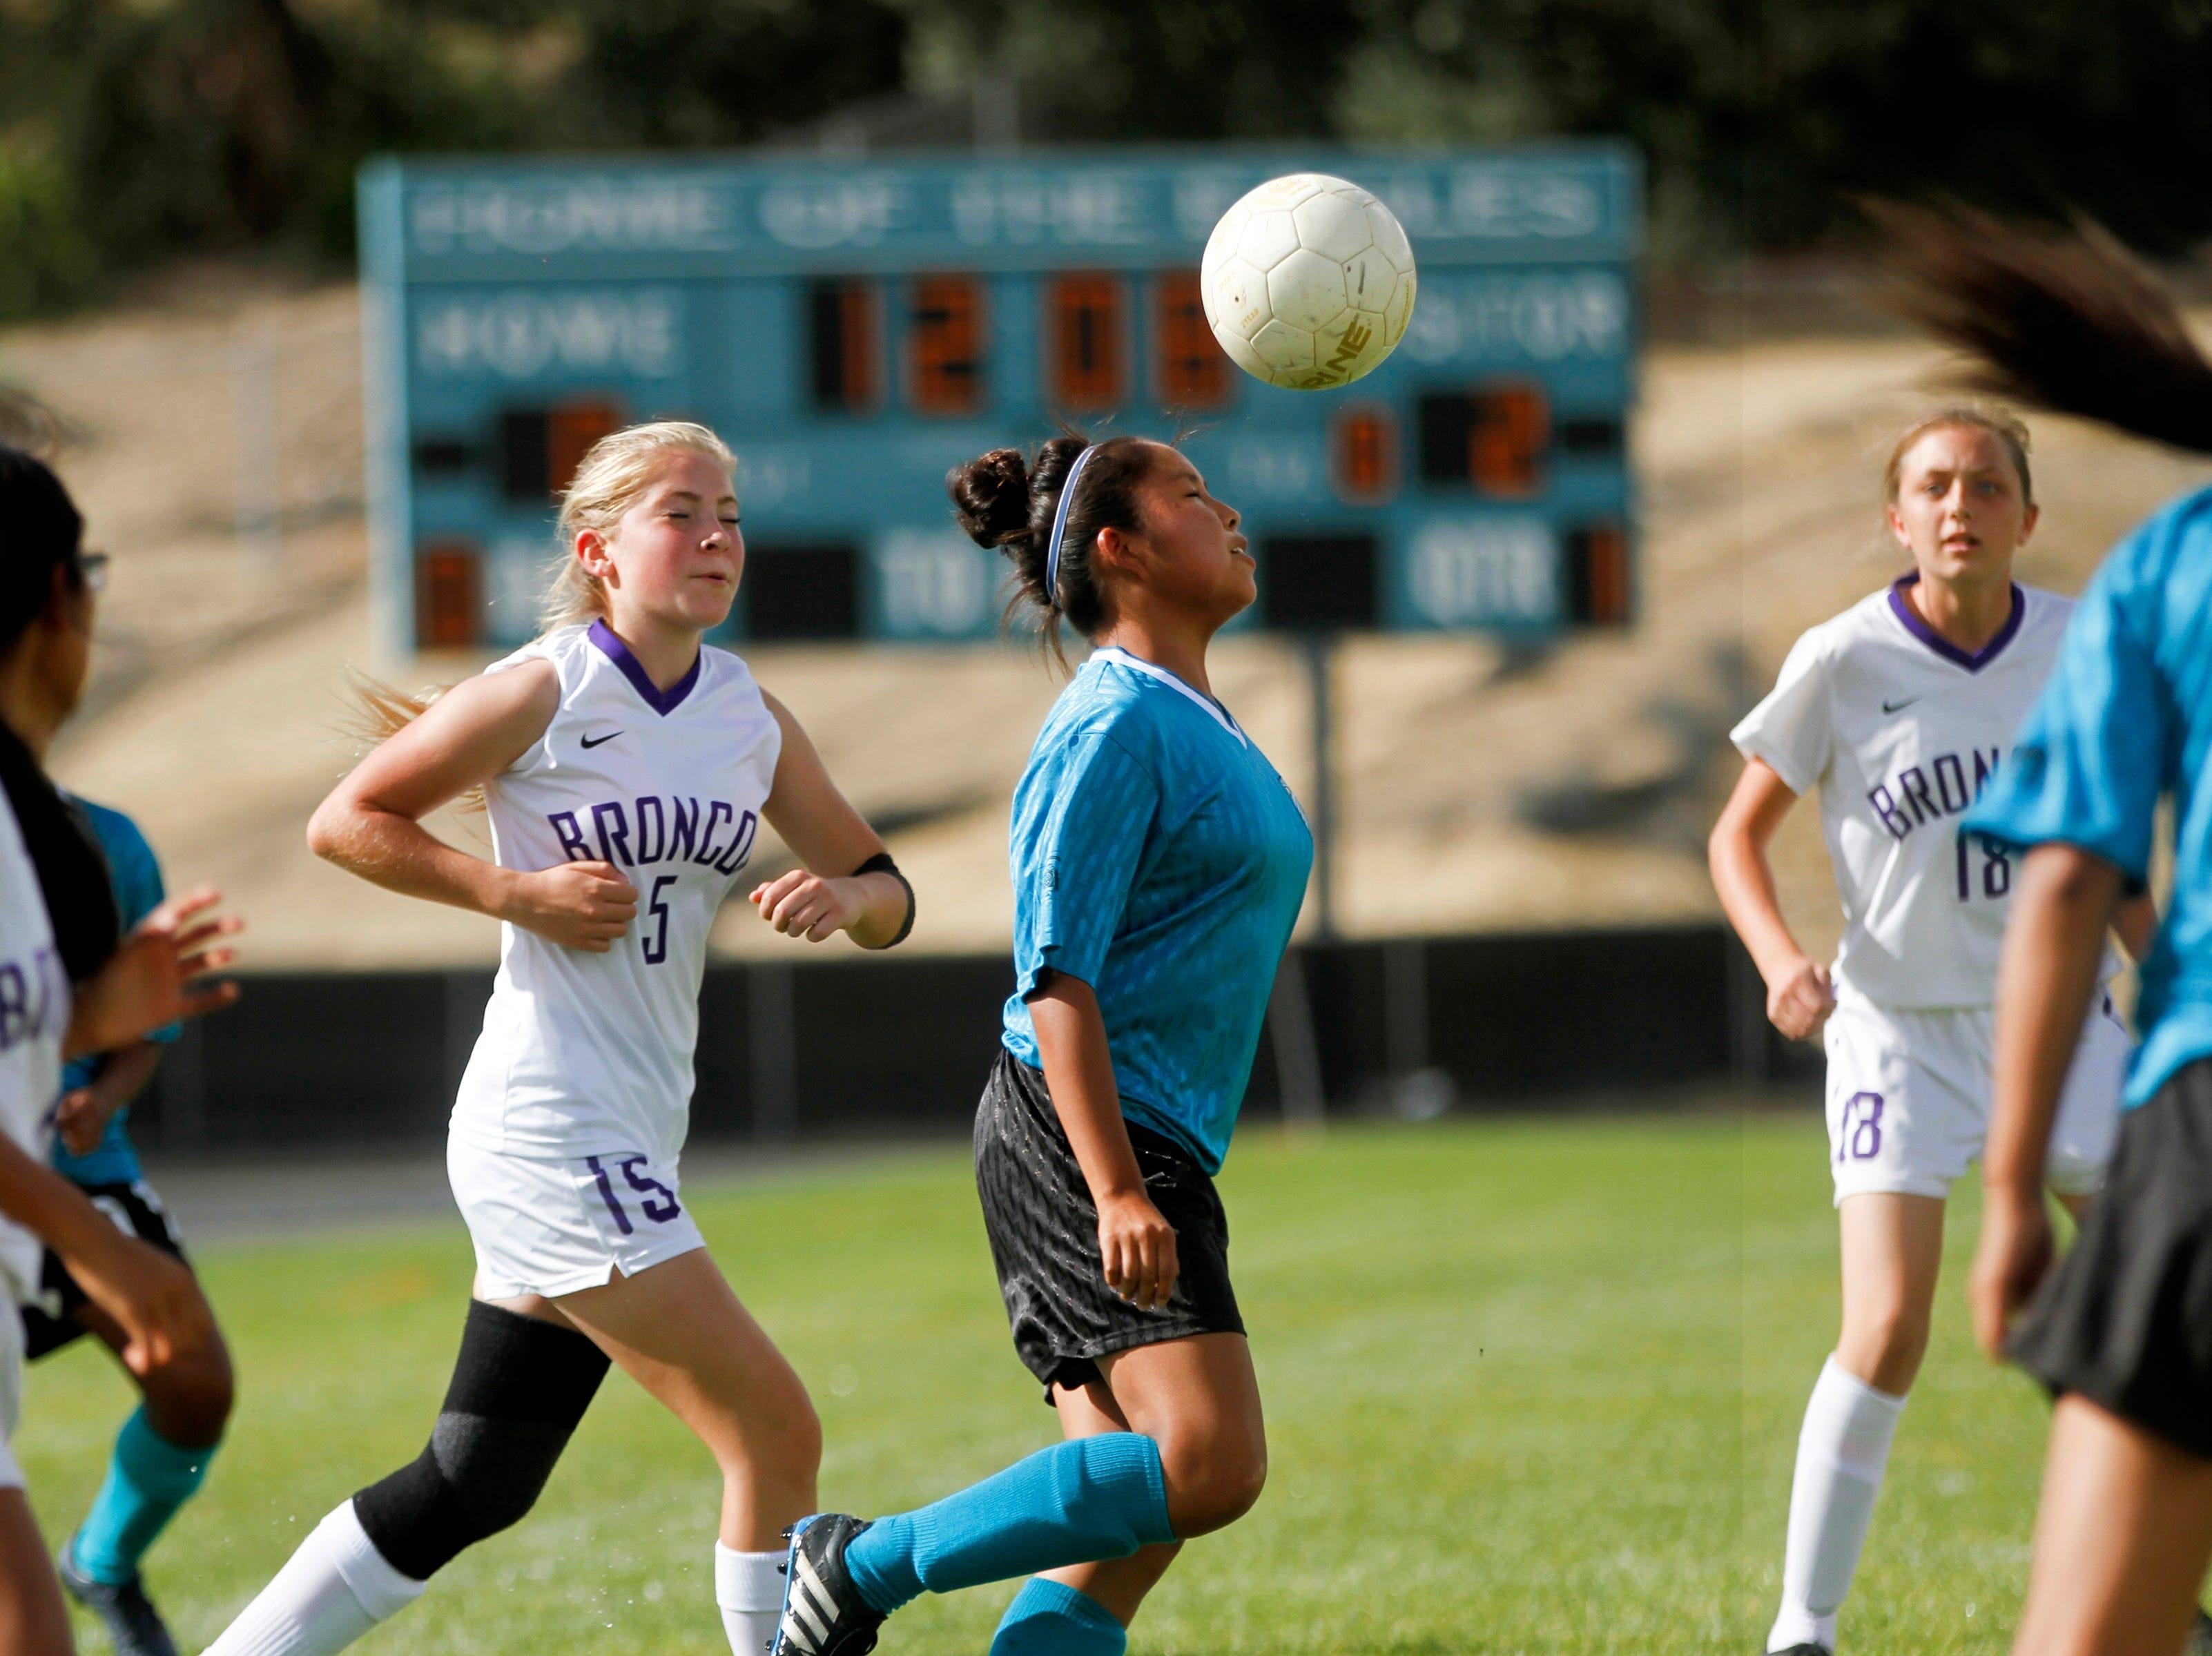 Navajo Prep's Shaynia Jackson gains possession of of the ball, Thursday, Sept. 6, 2018 during their game against Kirtland Central at Navajo Prep's Eagle Stadium in Farmington.